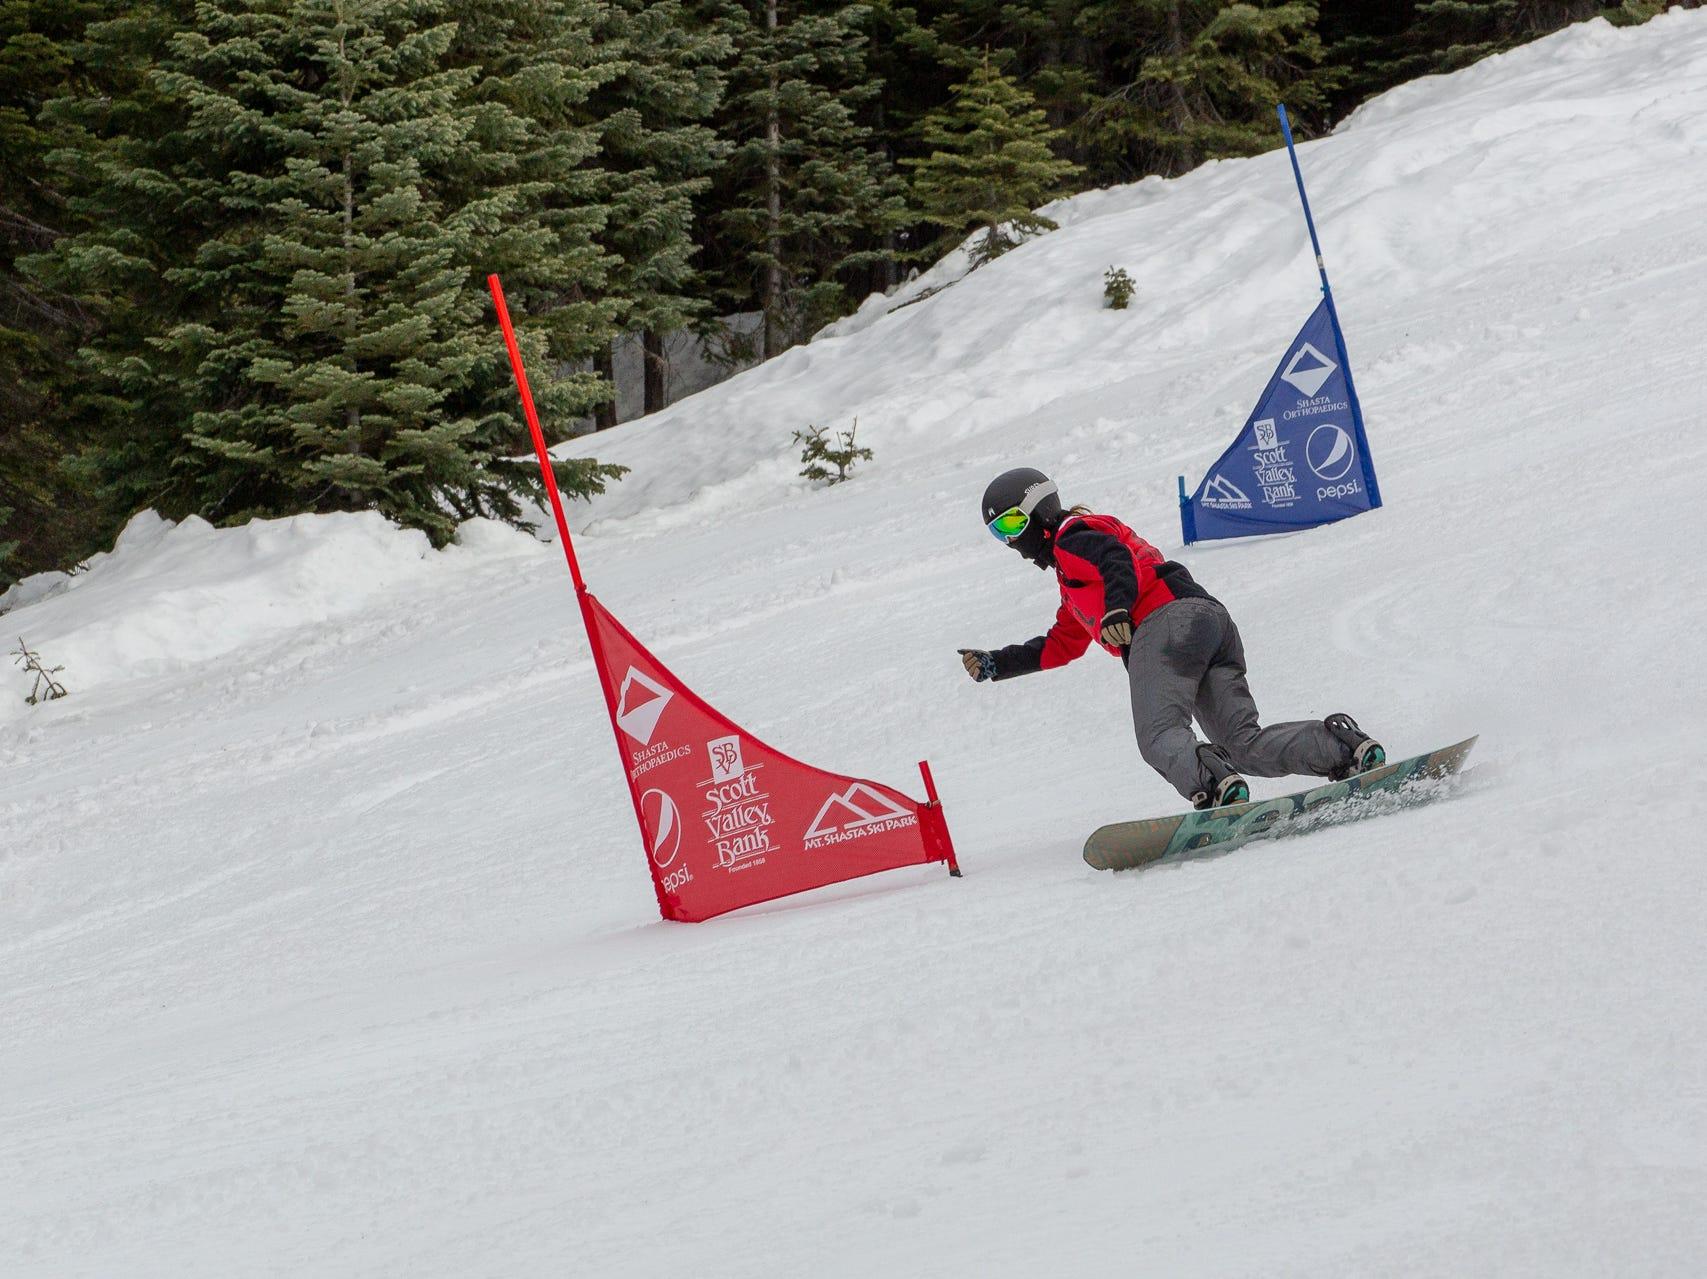 Mattie McKee of Foothill races in the third high school snowboard meet of 2019 on Monday, Jan. 28 at Mt. Shasta Ski Park.